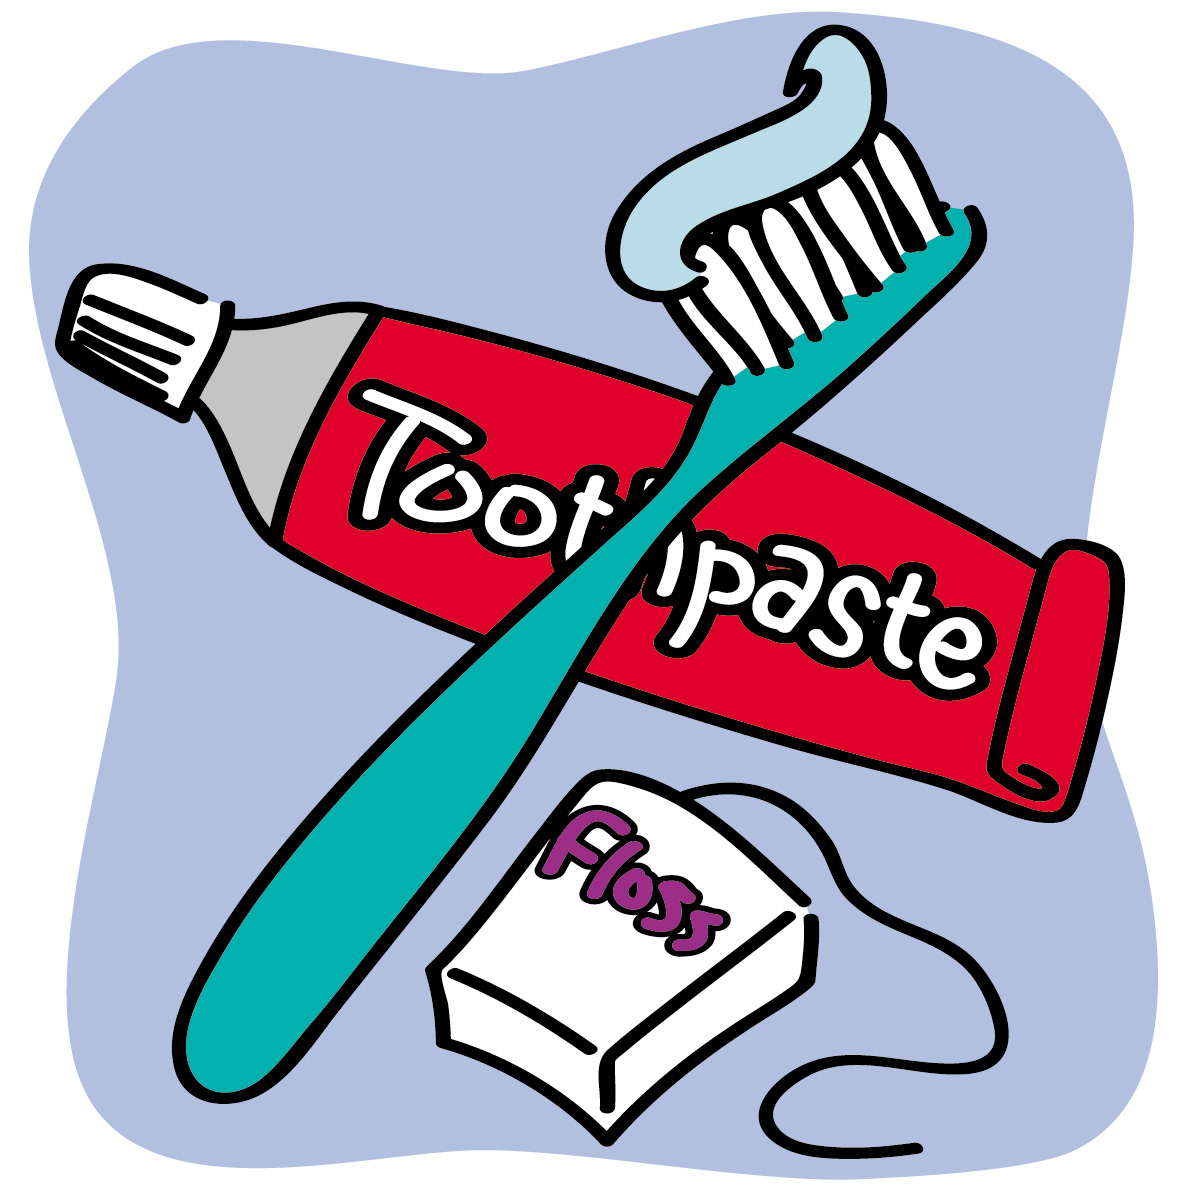 Dental health clipart 7 » Clipart Station.